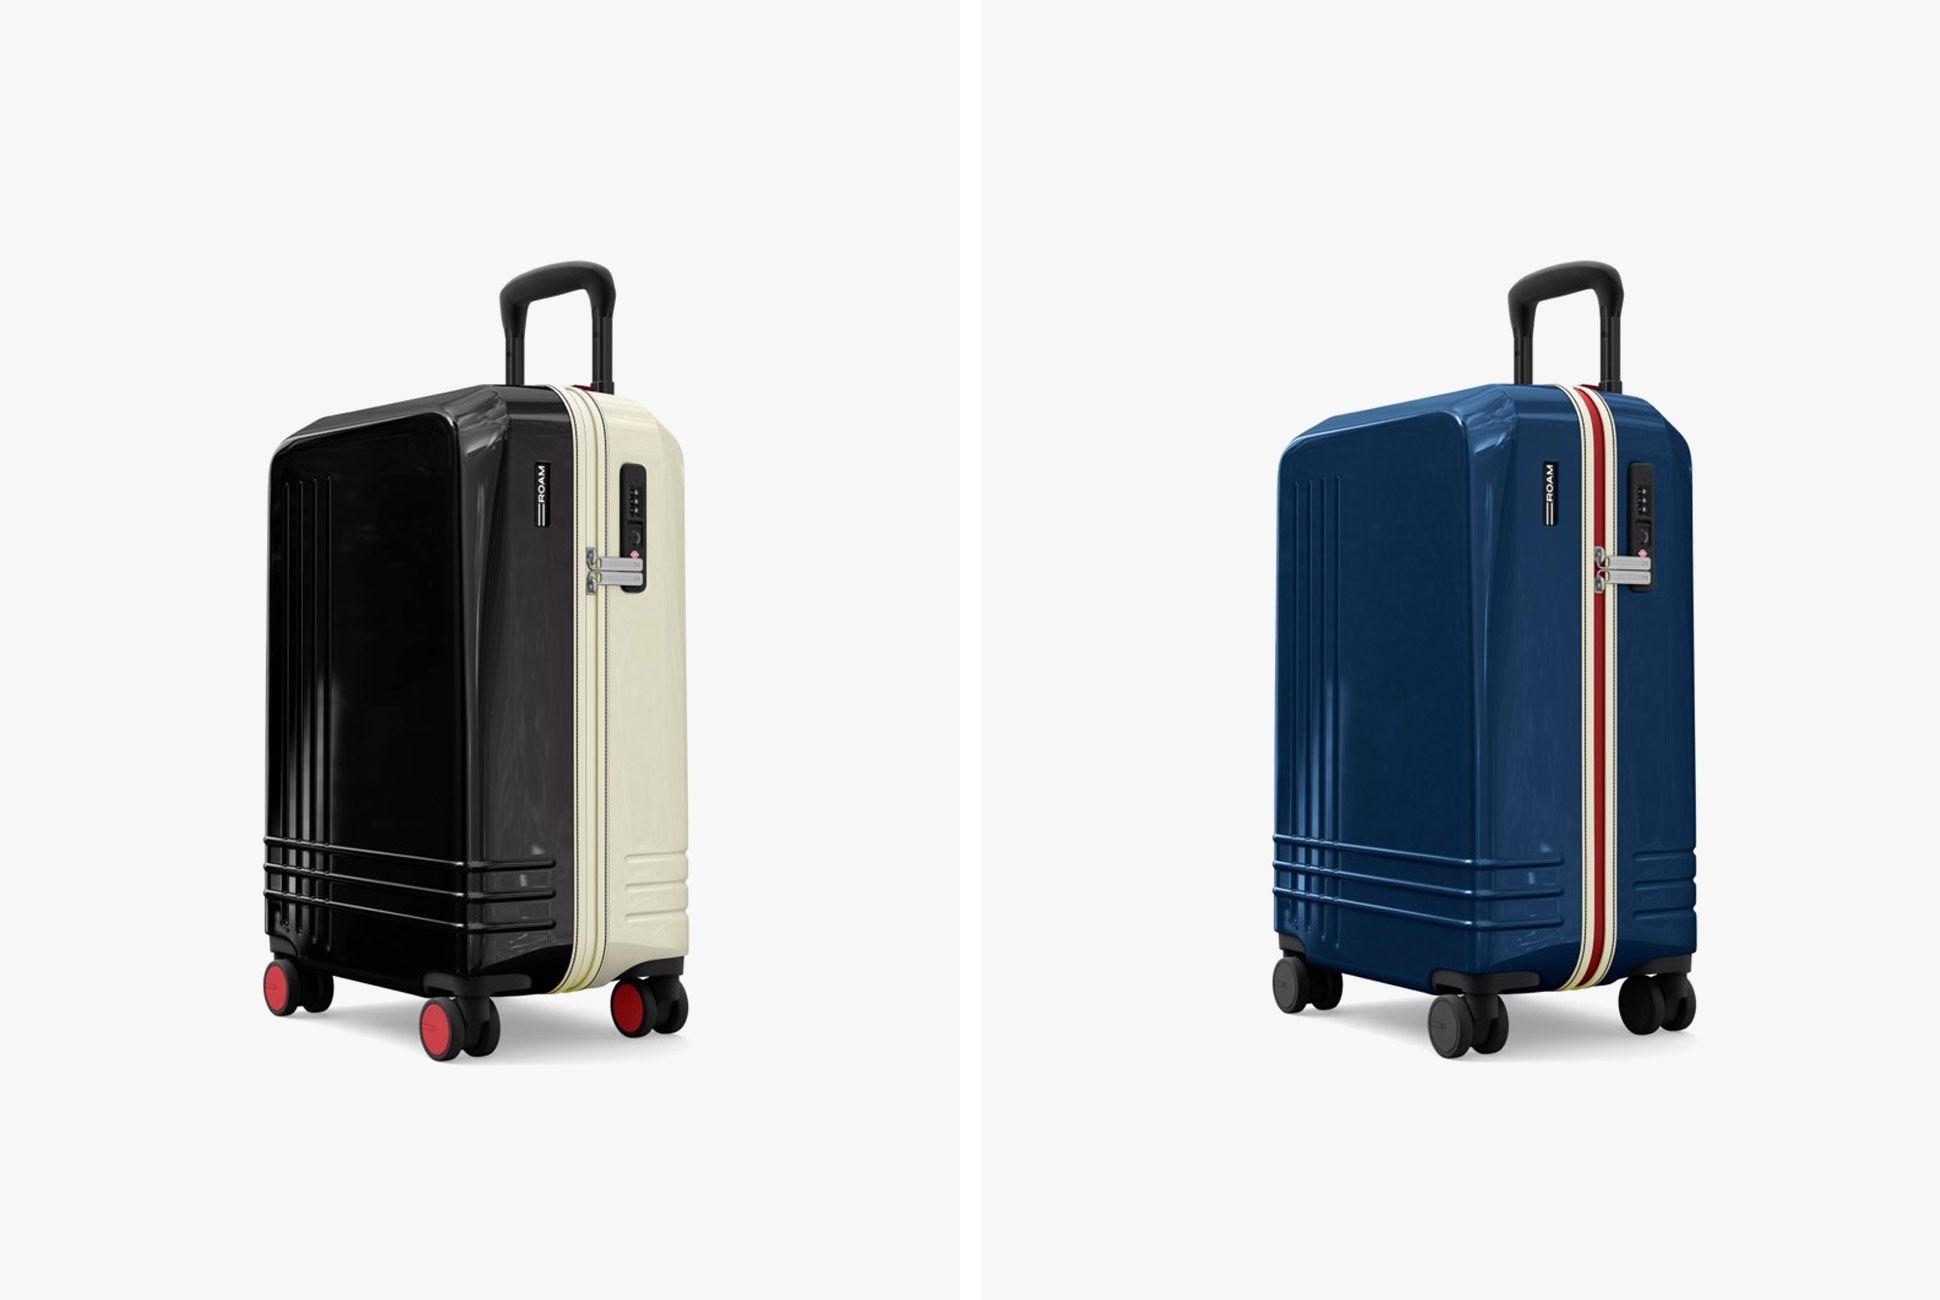 Roam-Suitcases-gear-patrol-1